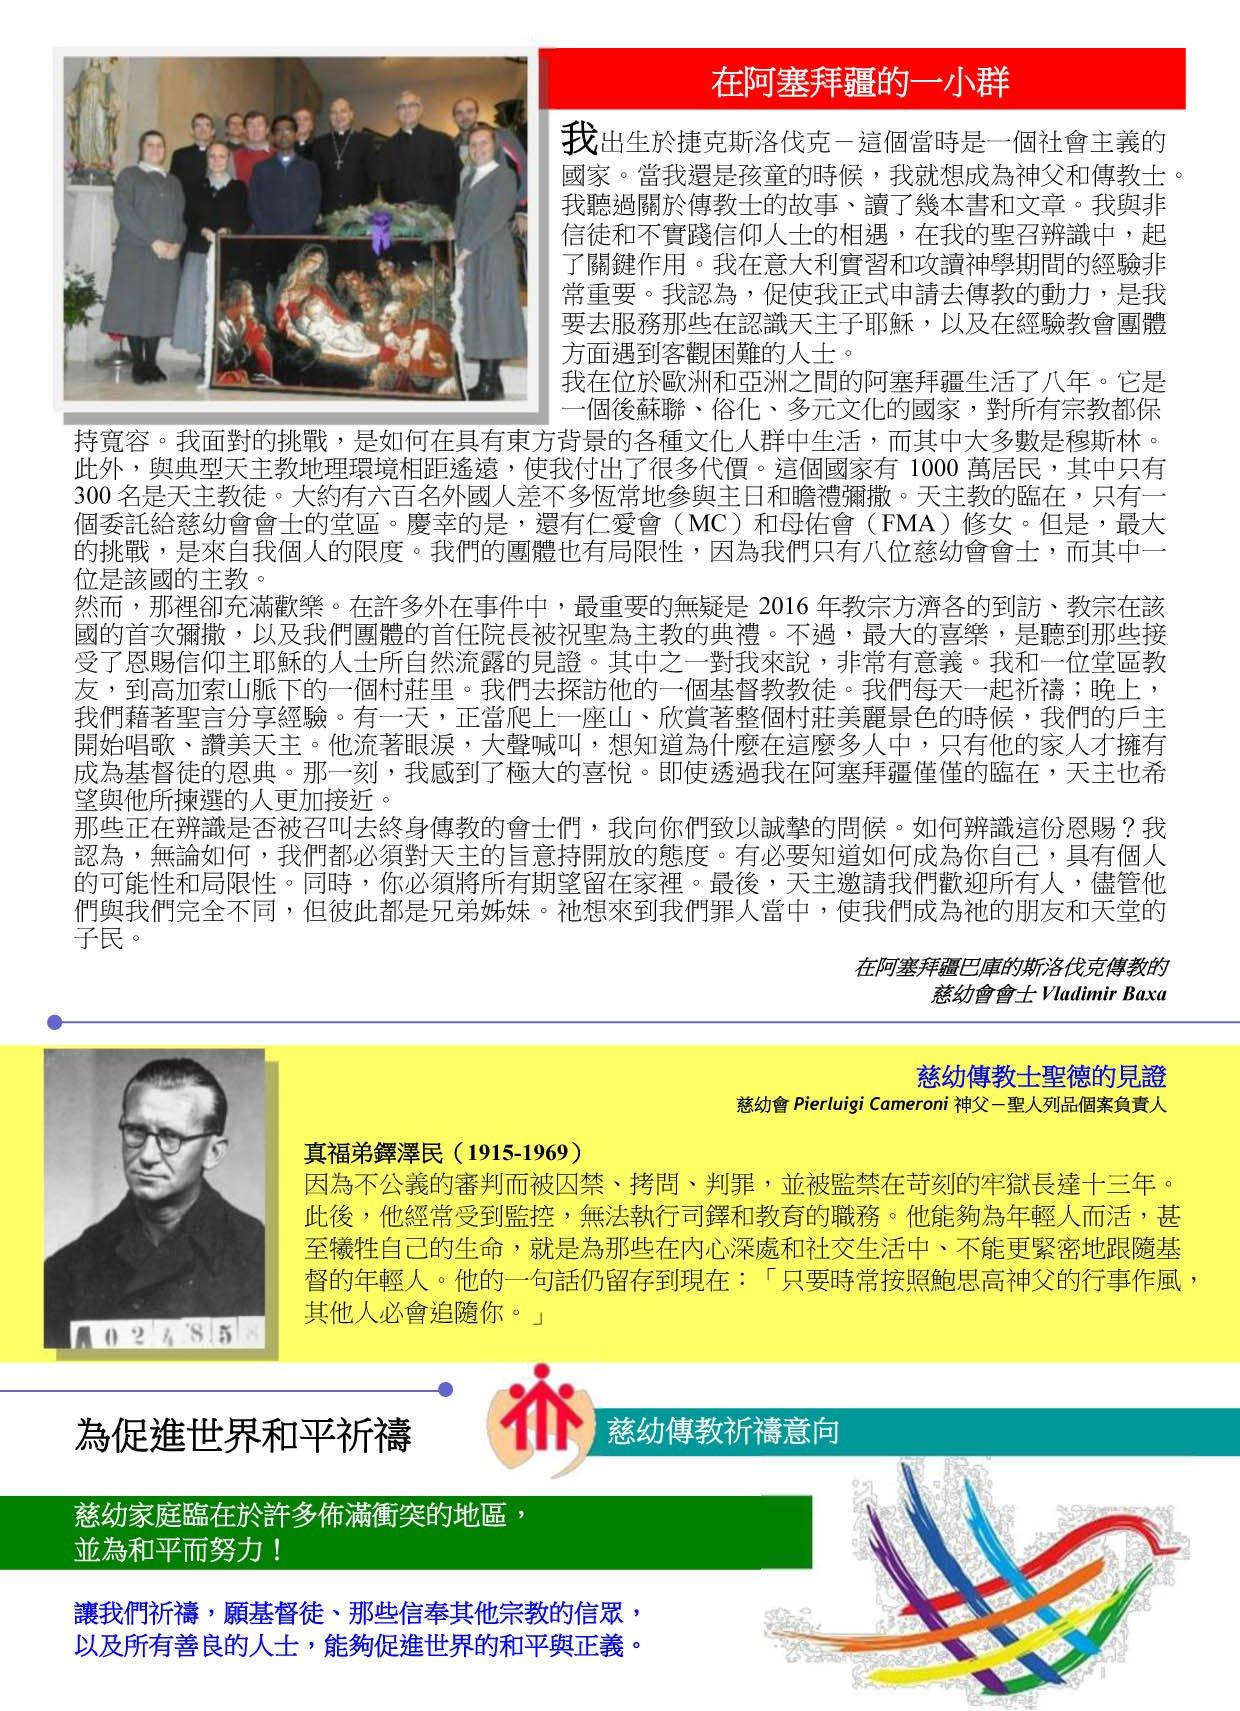 Cagliero 11 Jan 2020 中文-2